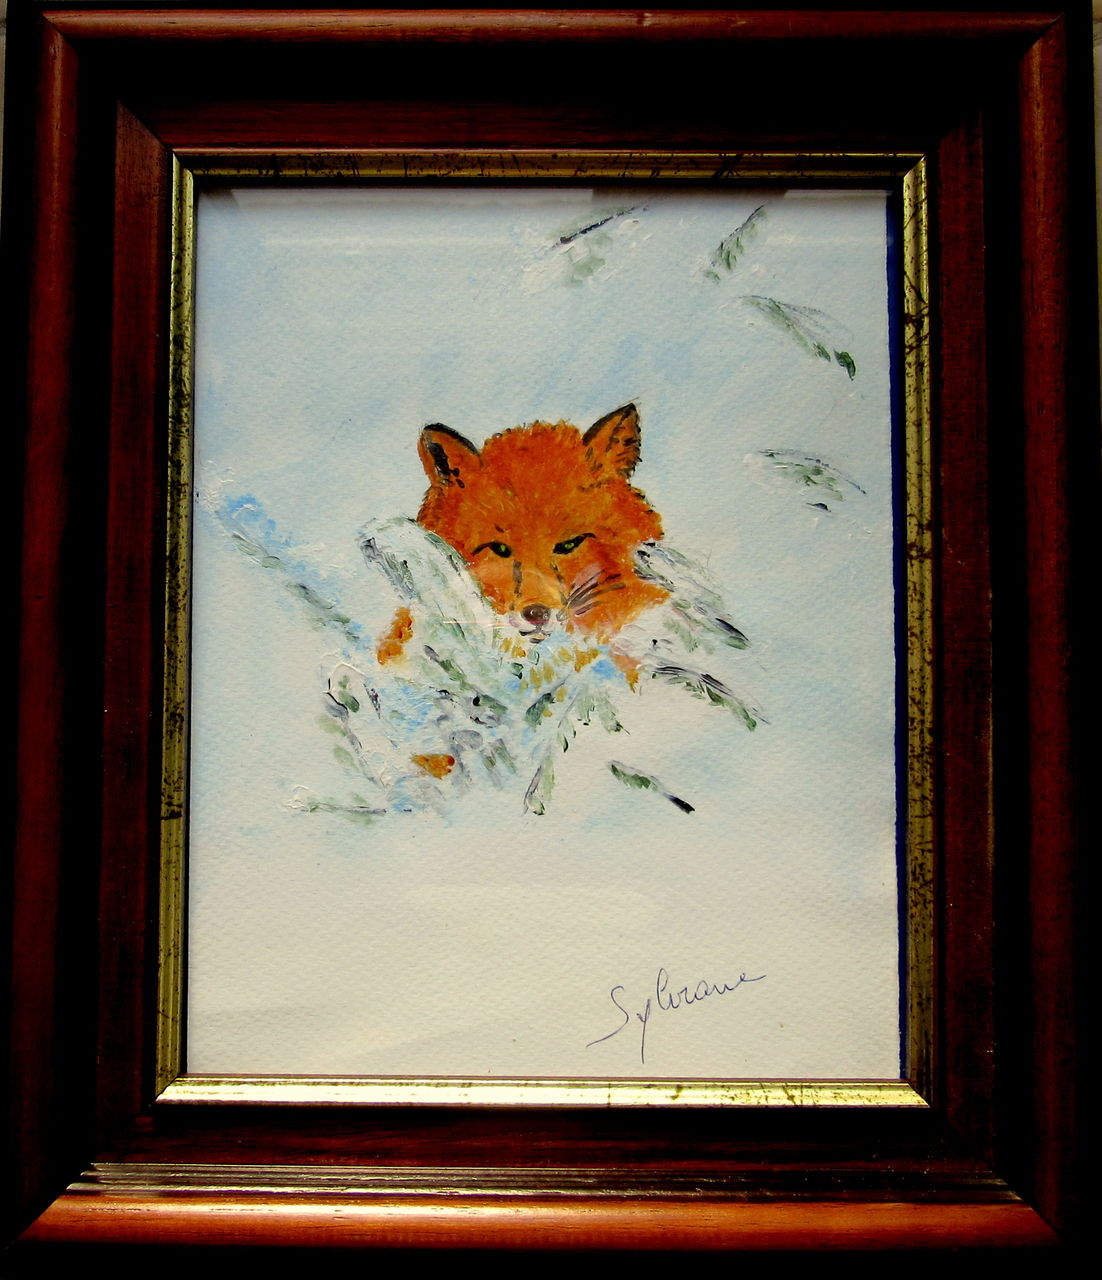 Michele martin petit renard.Sylviane.